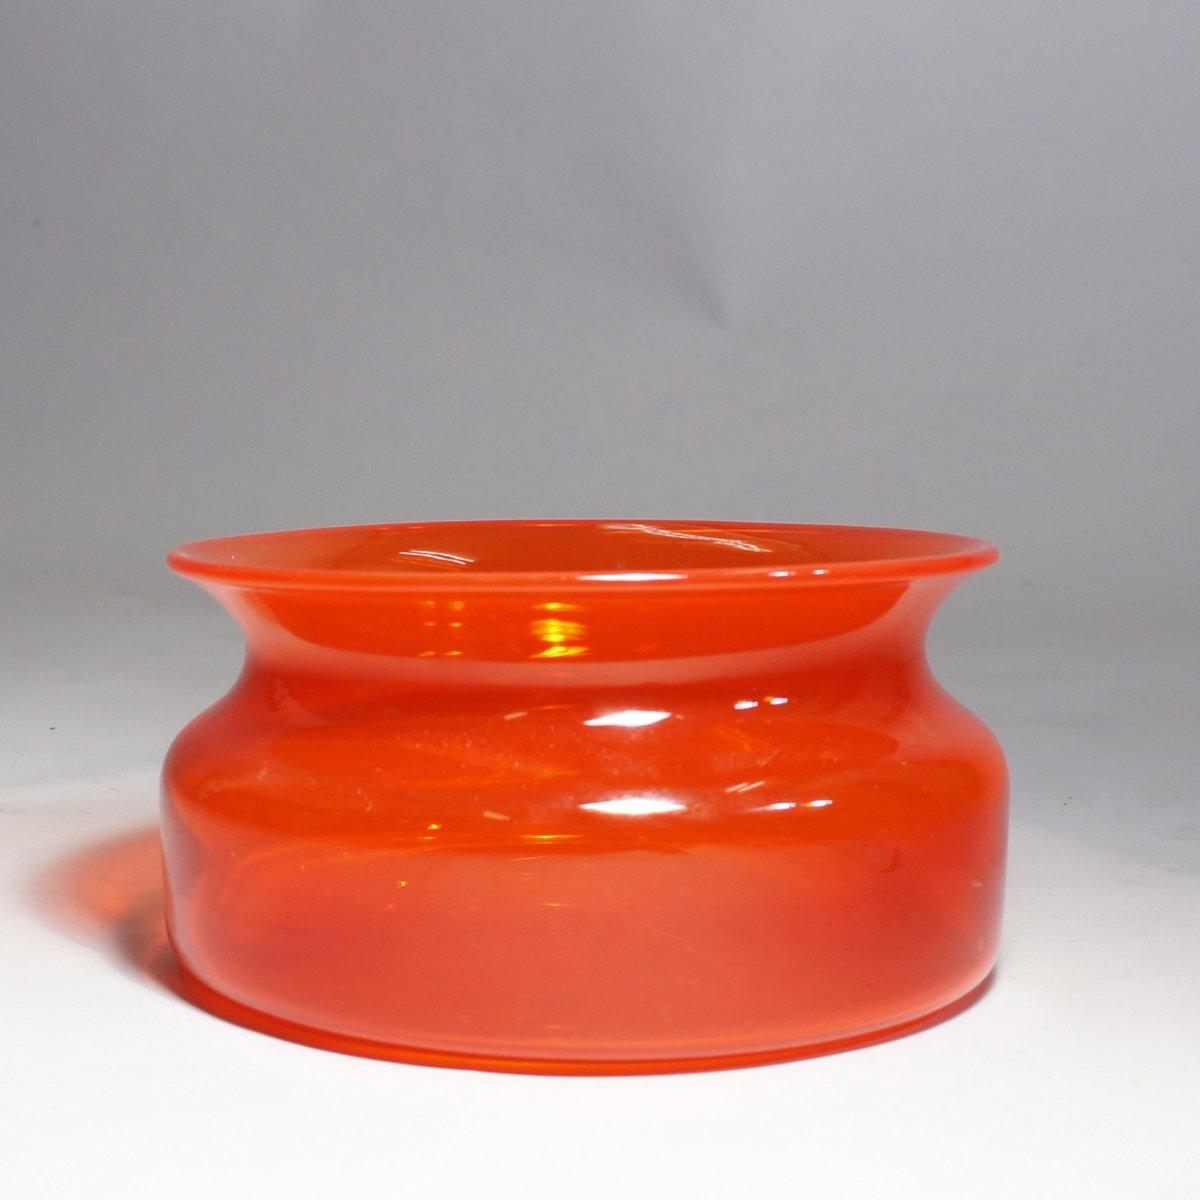 Vintage swedish glass bowl by erik hglund for kosta for sale at vintage swedish glass bowl by erik hglund for kosta reviewsmspy